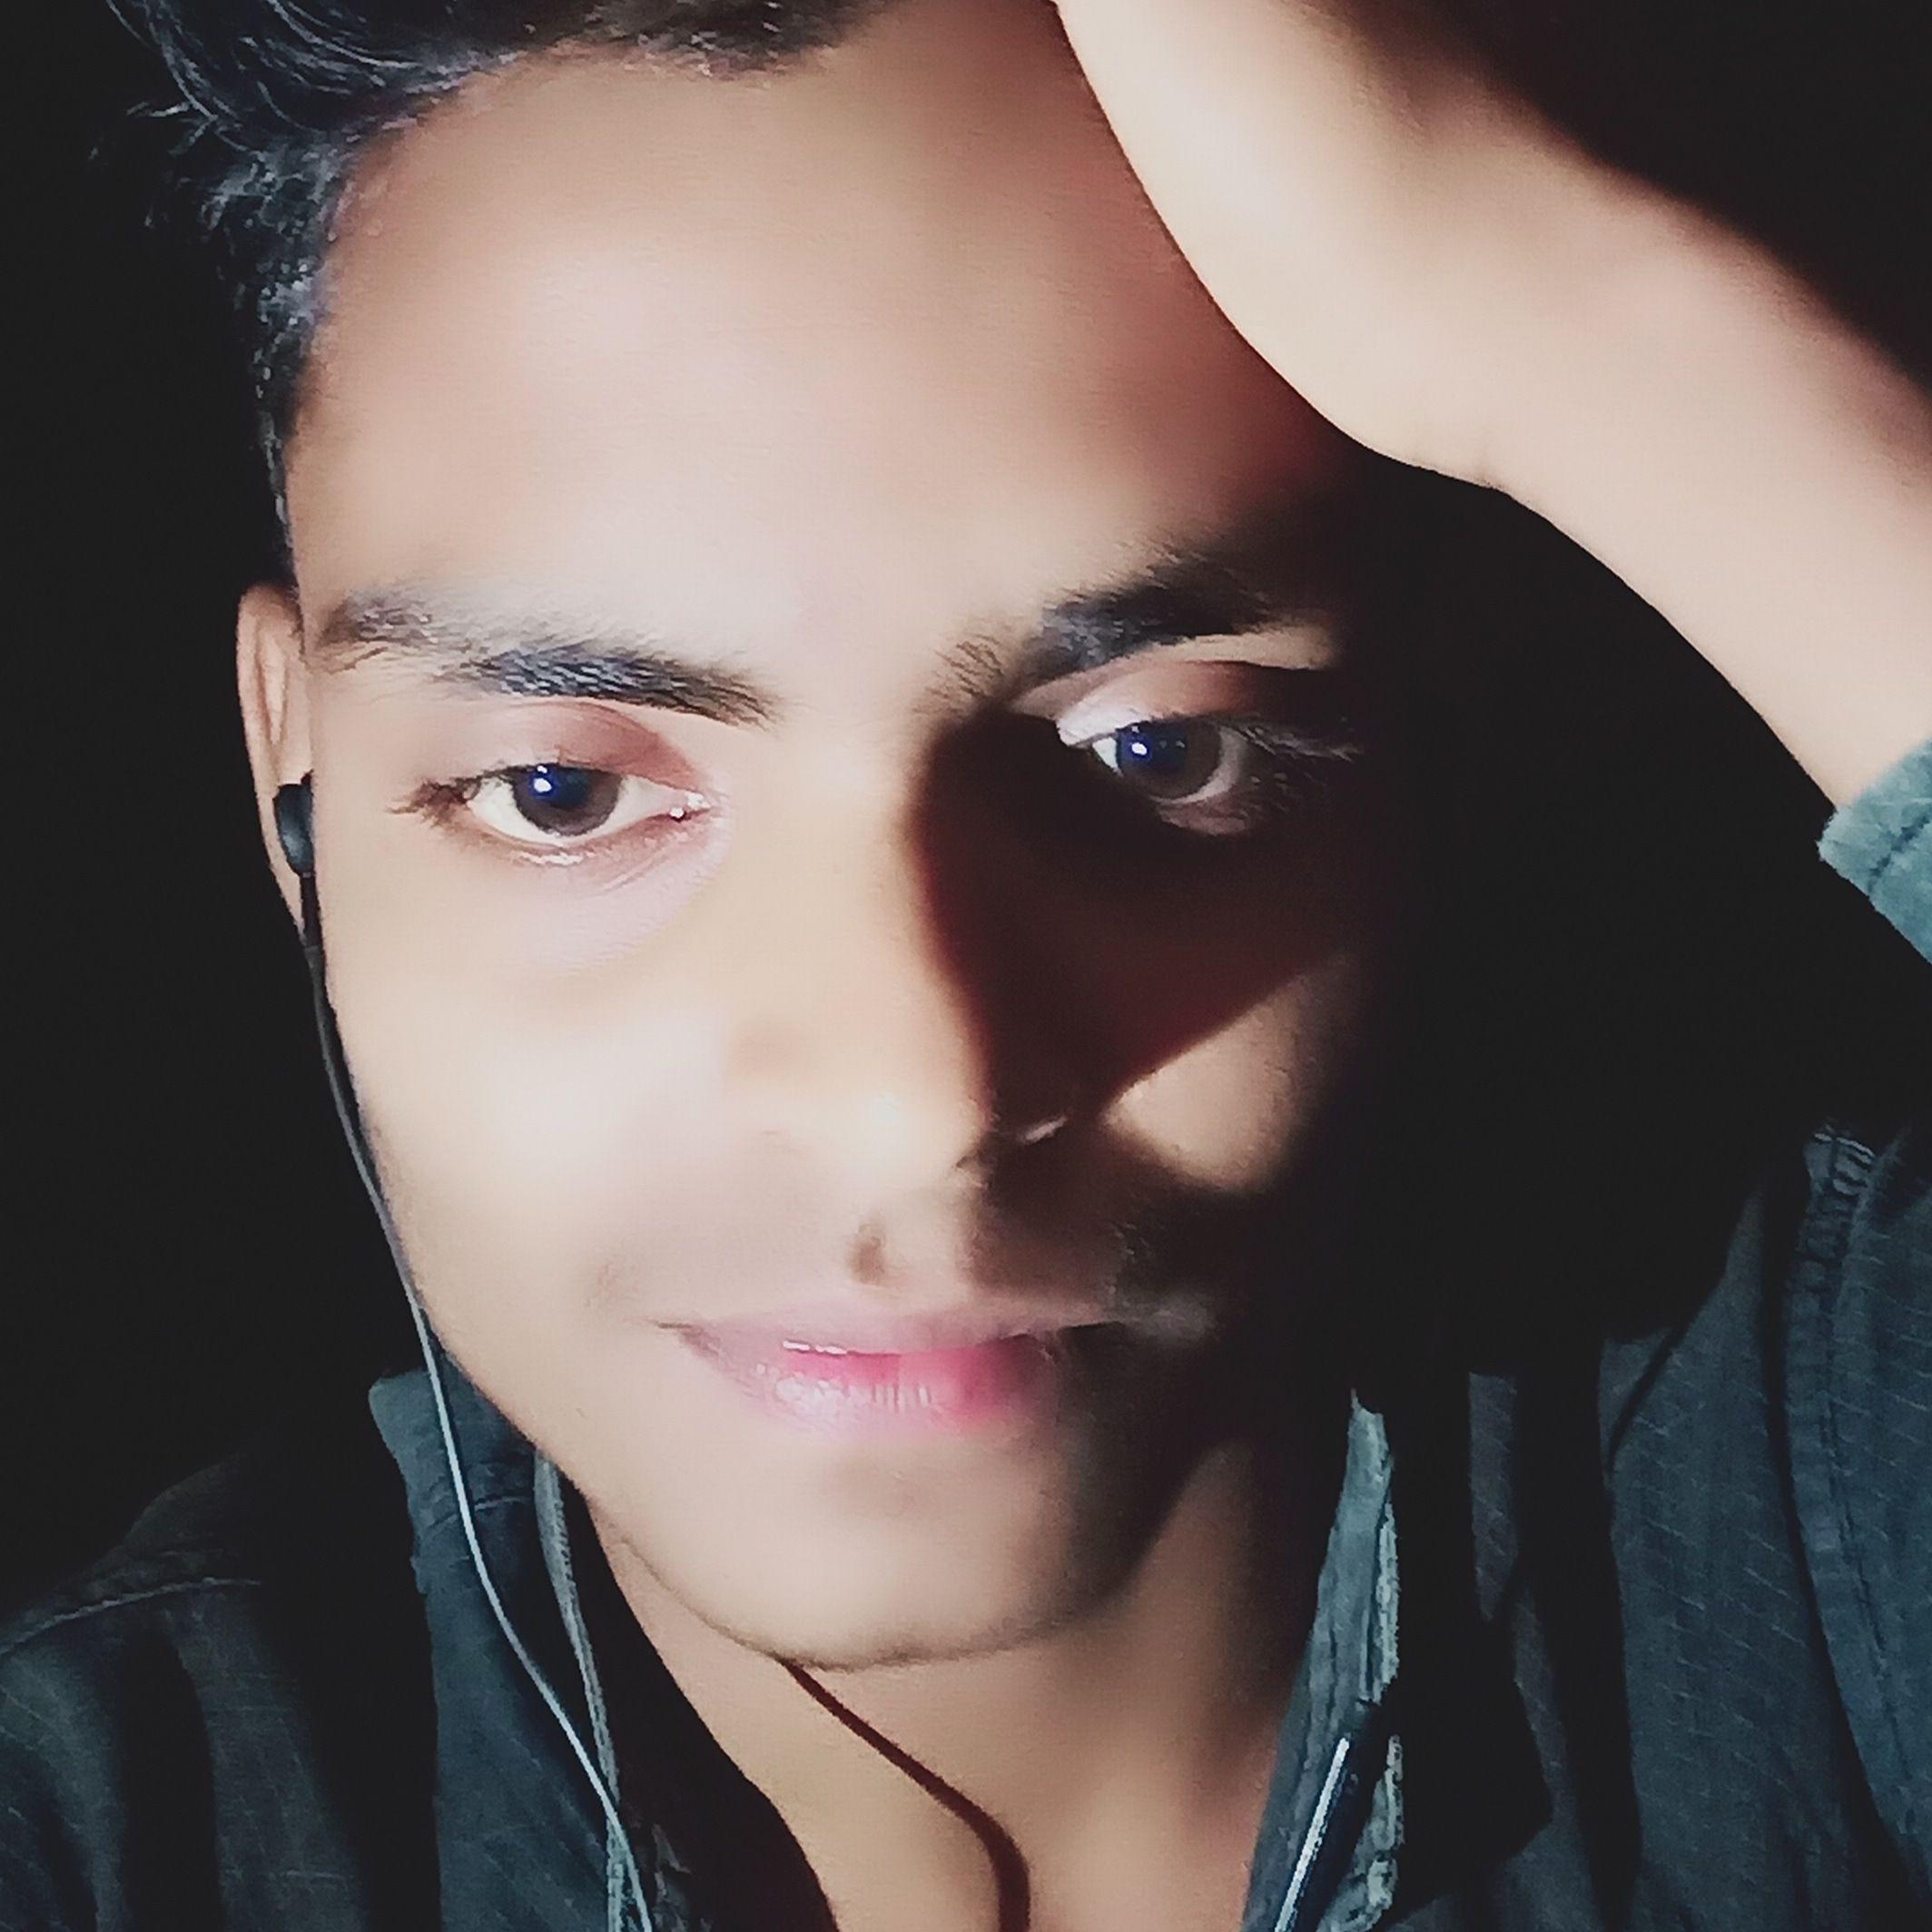 krishna singh